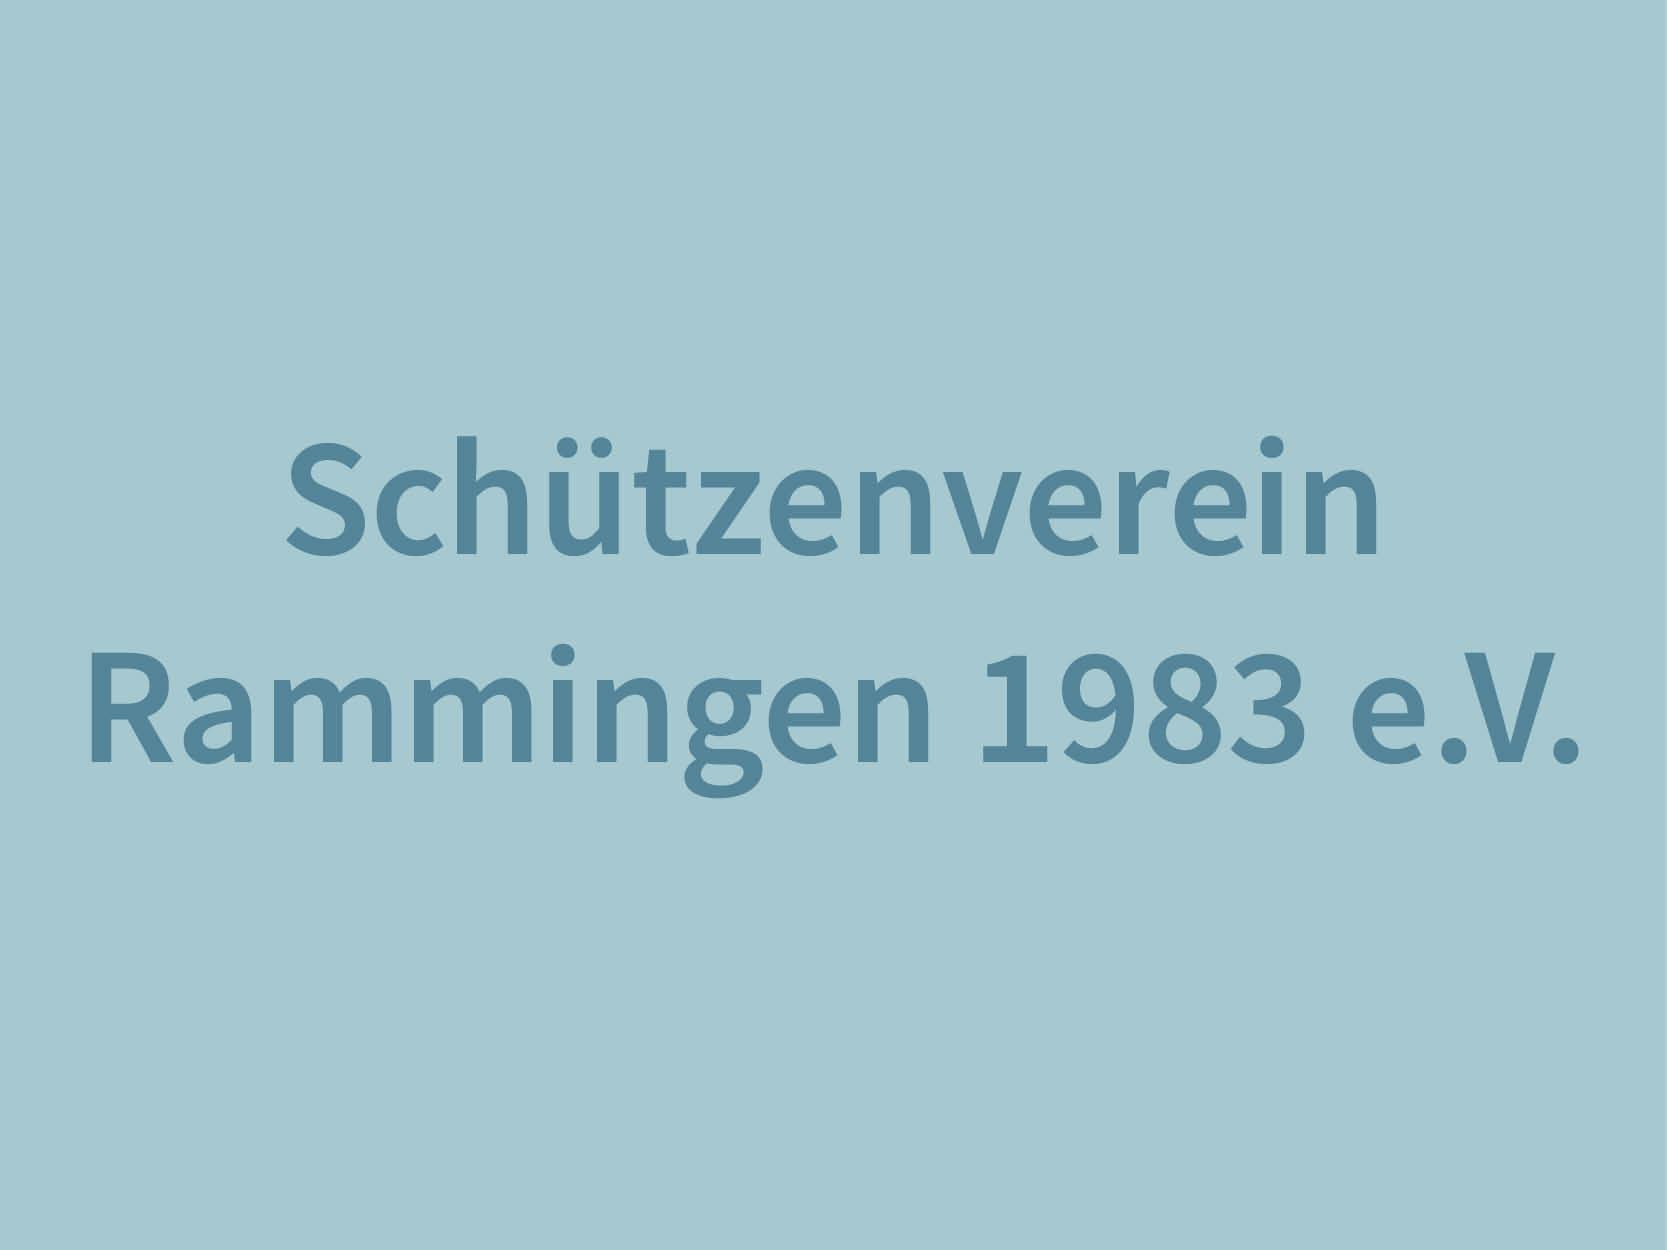 Schützenverein Rammingen 1983 e.V., Baden-Würrtemberg, Alb-Donau Kreis